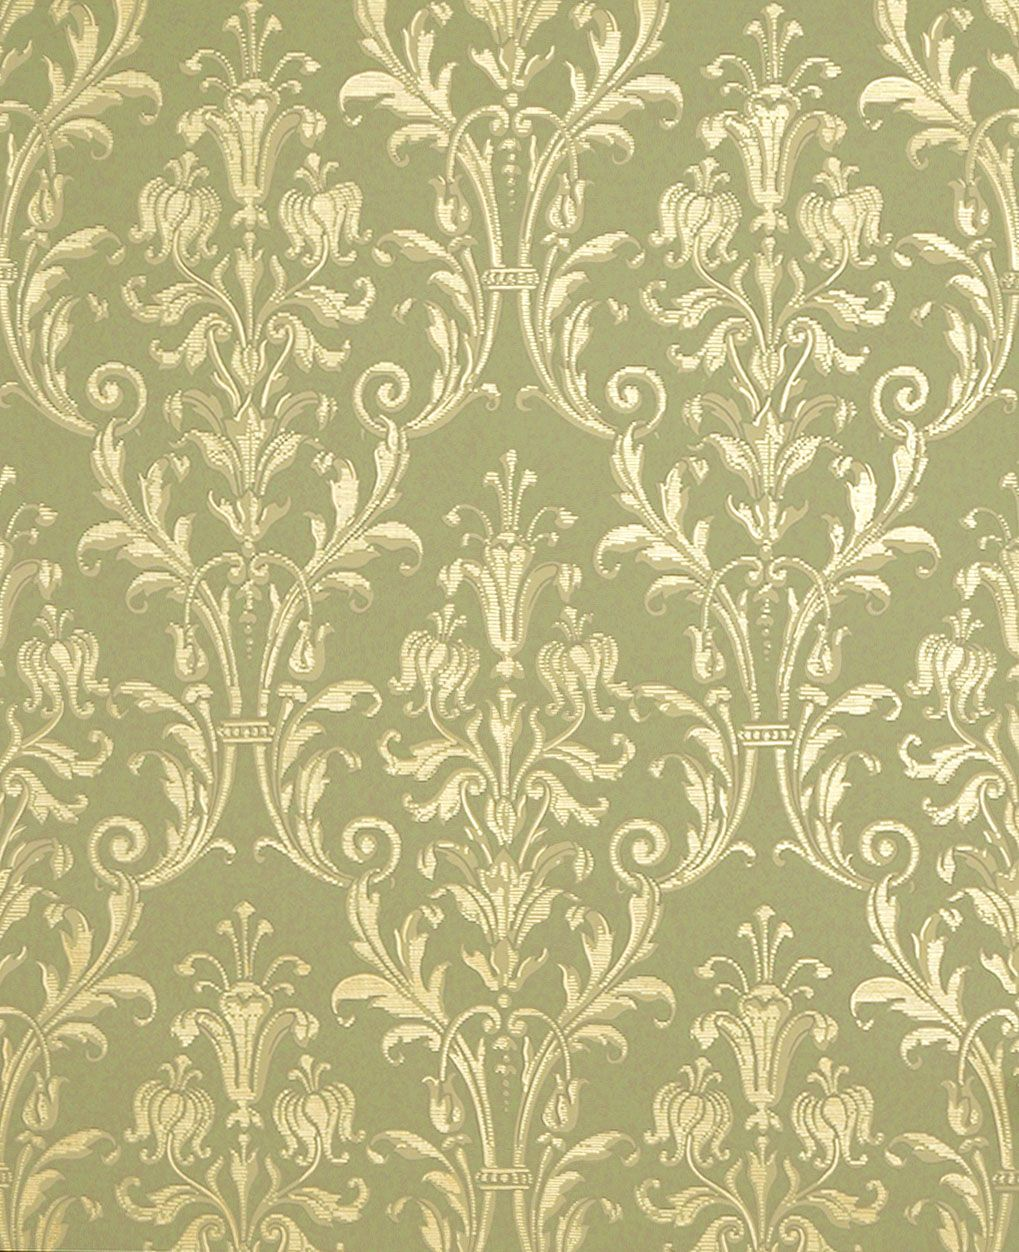 tapete 401 f senator grau historische tapeten. Black Bedroom Furniture Sets. Home Design Ideas